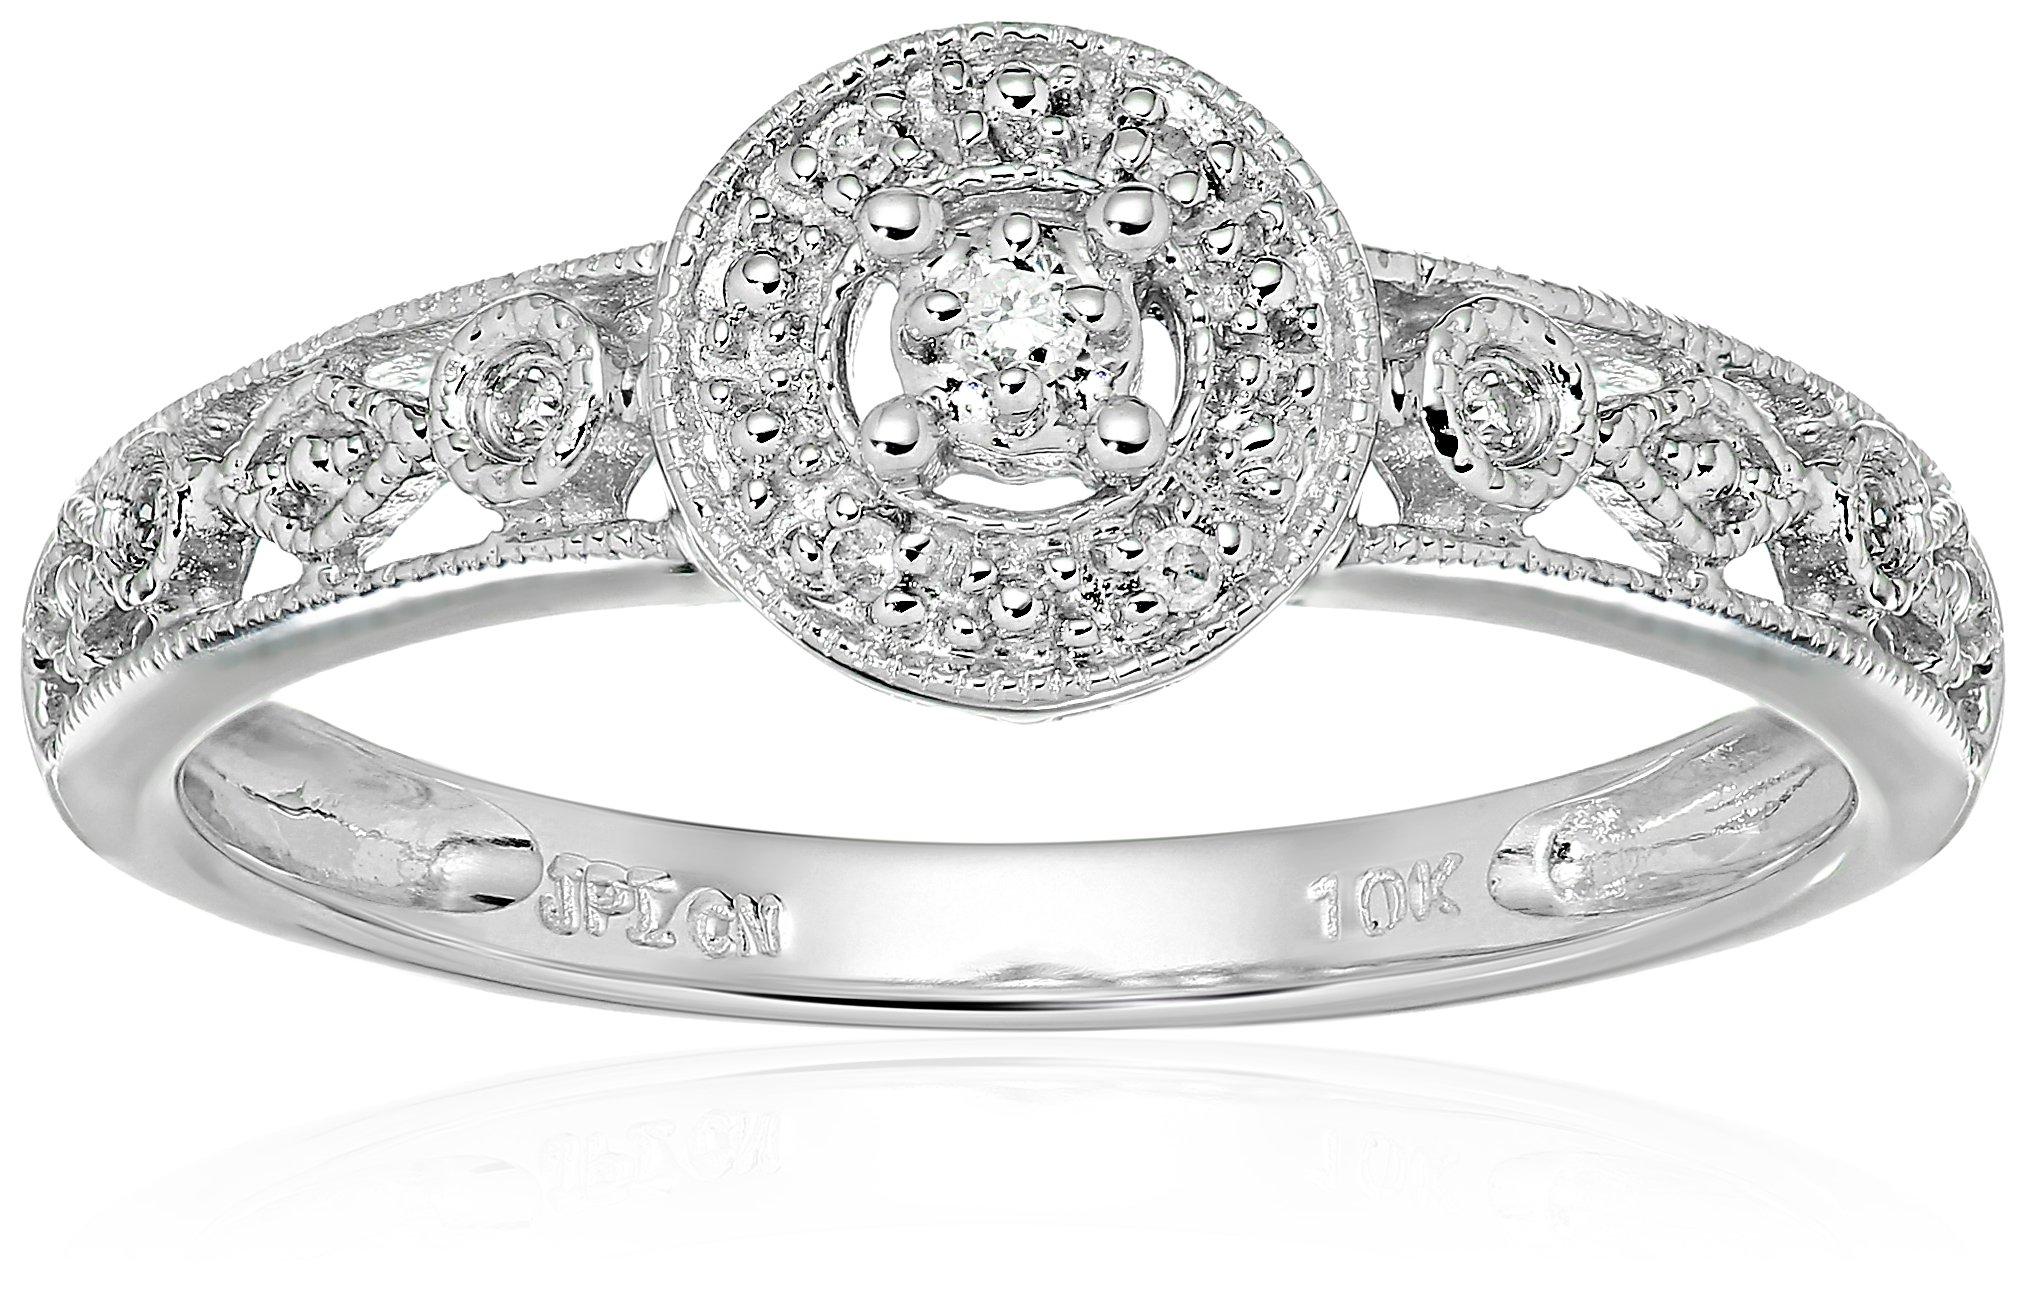 10k White Gold Circle Vintage Diamond Accent Promise Ring, Size 7